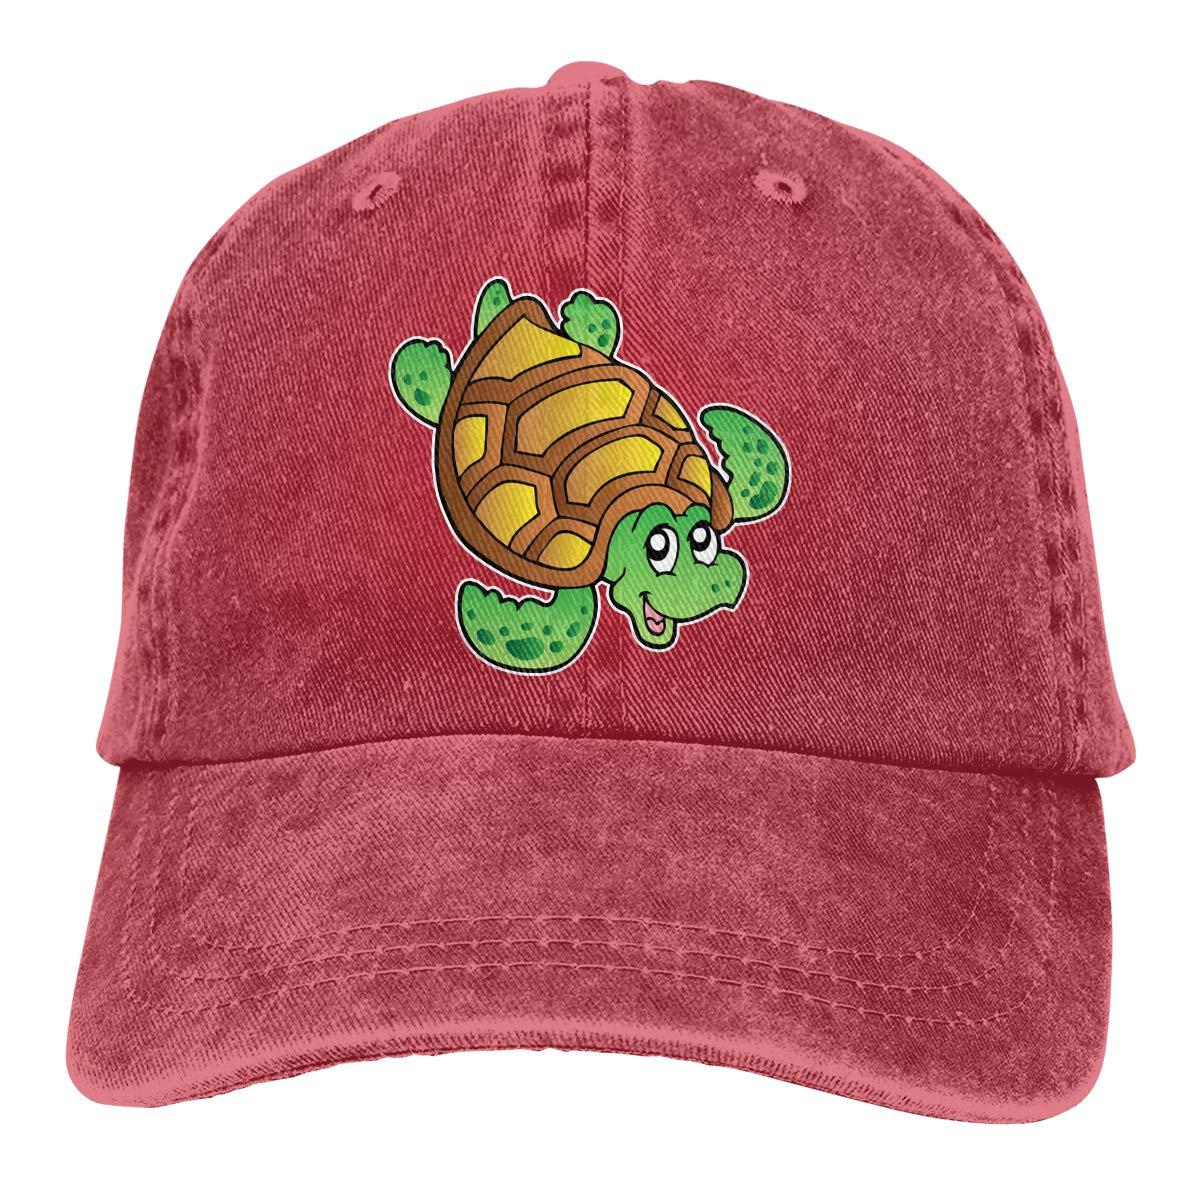 Unisex Cute Little Sea Turtle Vintage Washed Dad Hat Cute Adjustable Baseball Cap